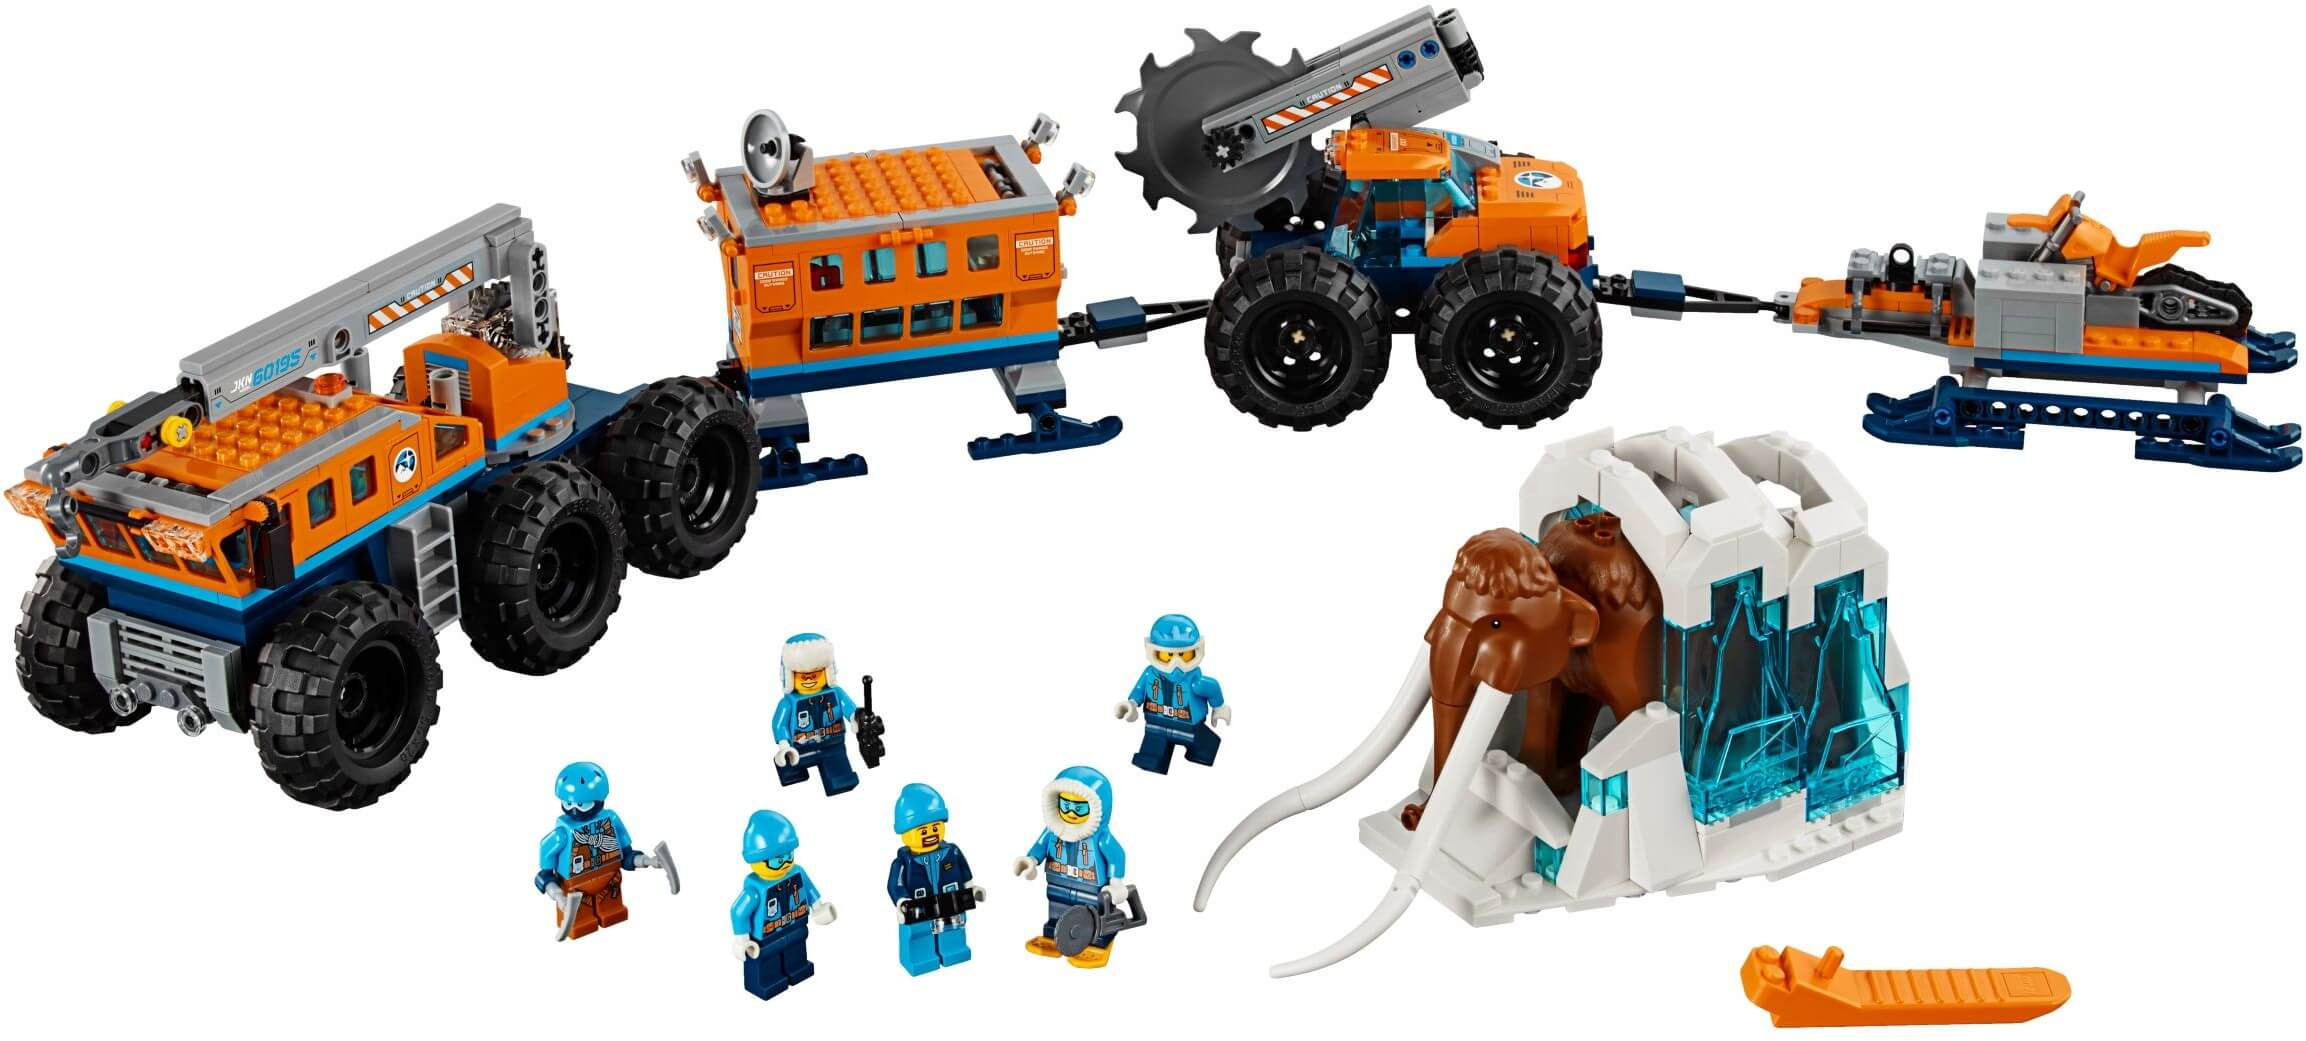 Mua đồ chơi LEGO 60195 - LEGO City 60195 - Đội Xe Thám Hiểm Bắc Cực (LEGO 60195 Arctic Mobile Exploration Base)